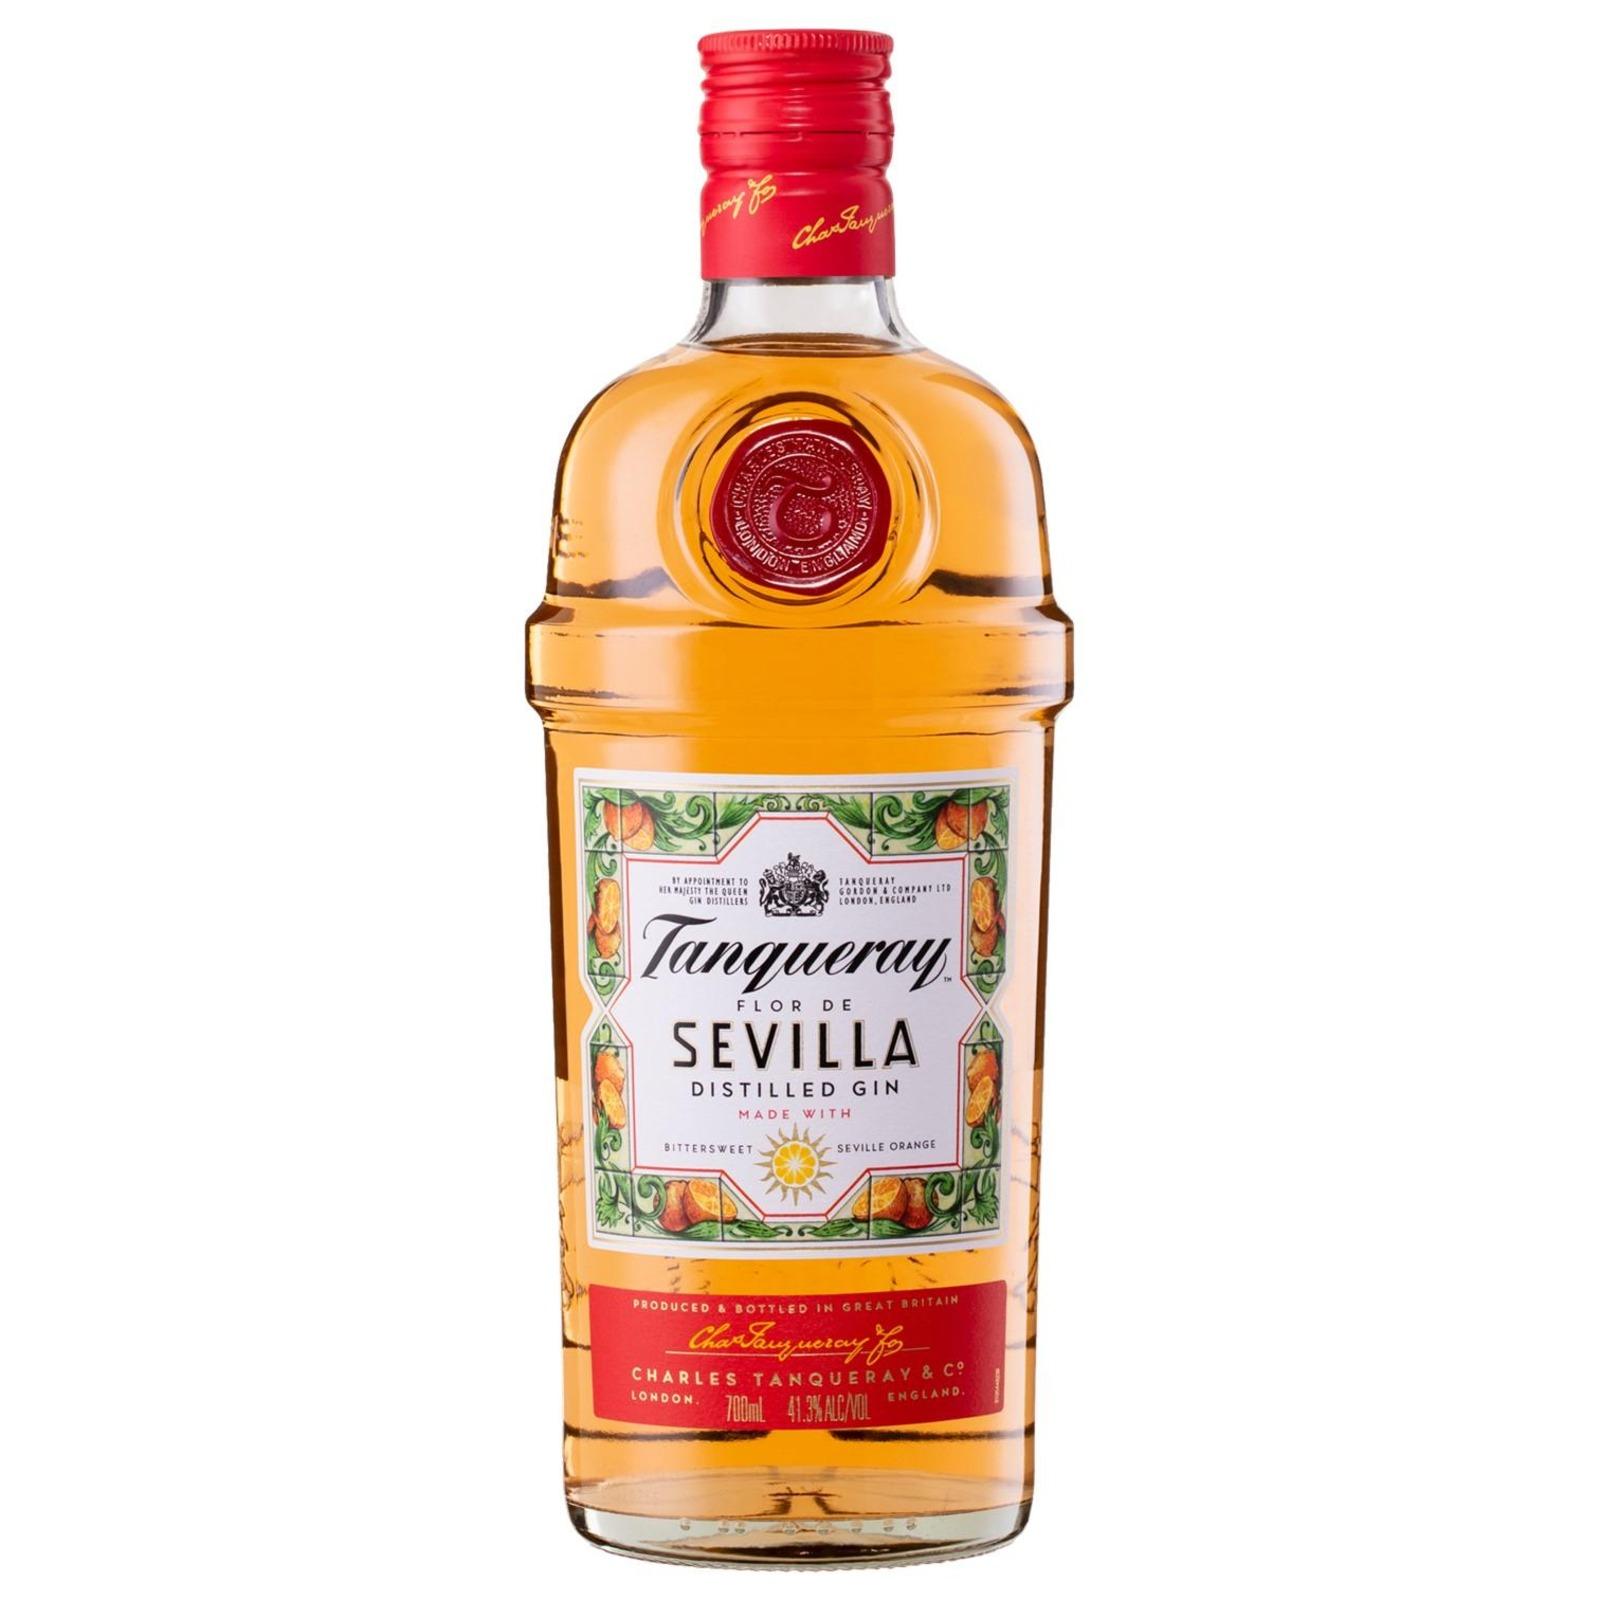 Tanqueray Sevilla Gin